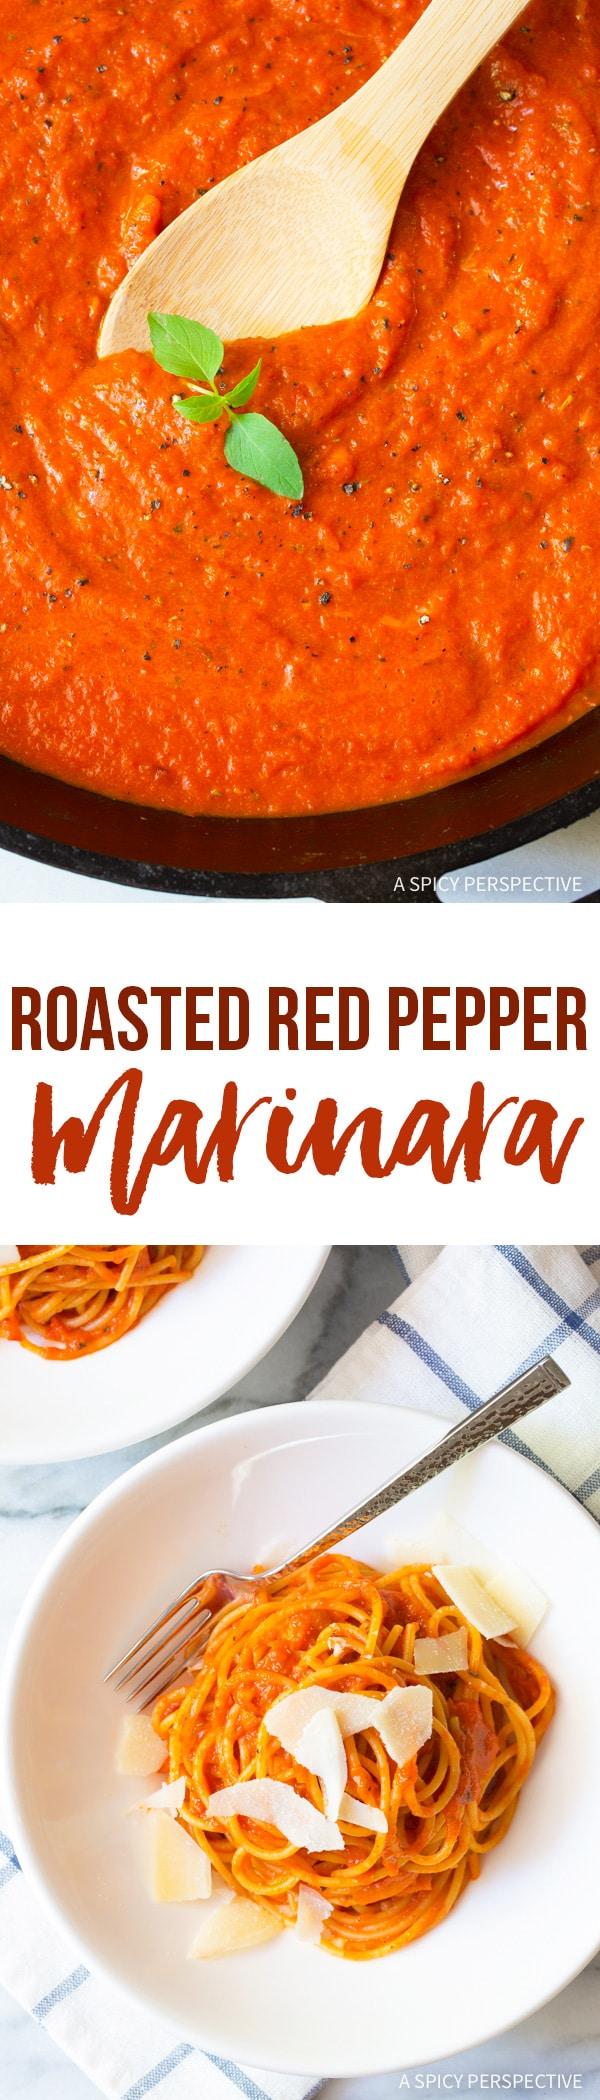 The Best Roasted Red Pepper Marinara Recipe (Vegan, Gluten Free & Delicious!)